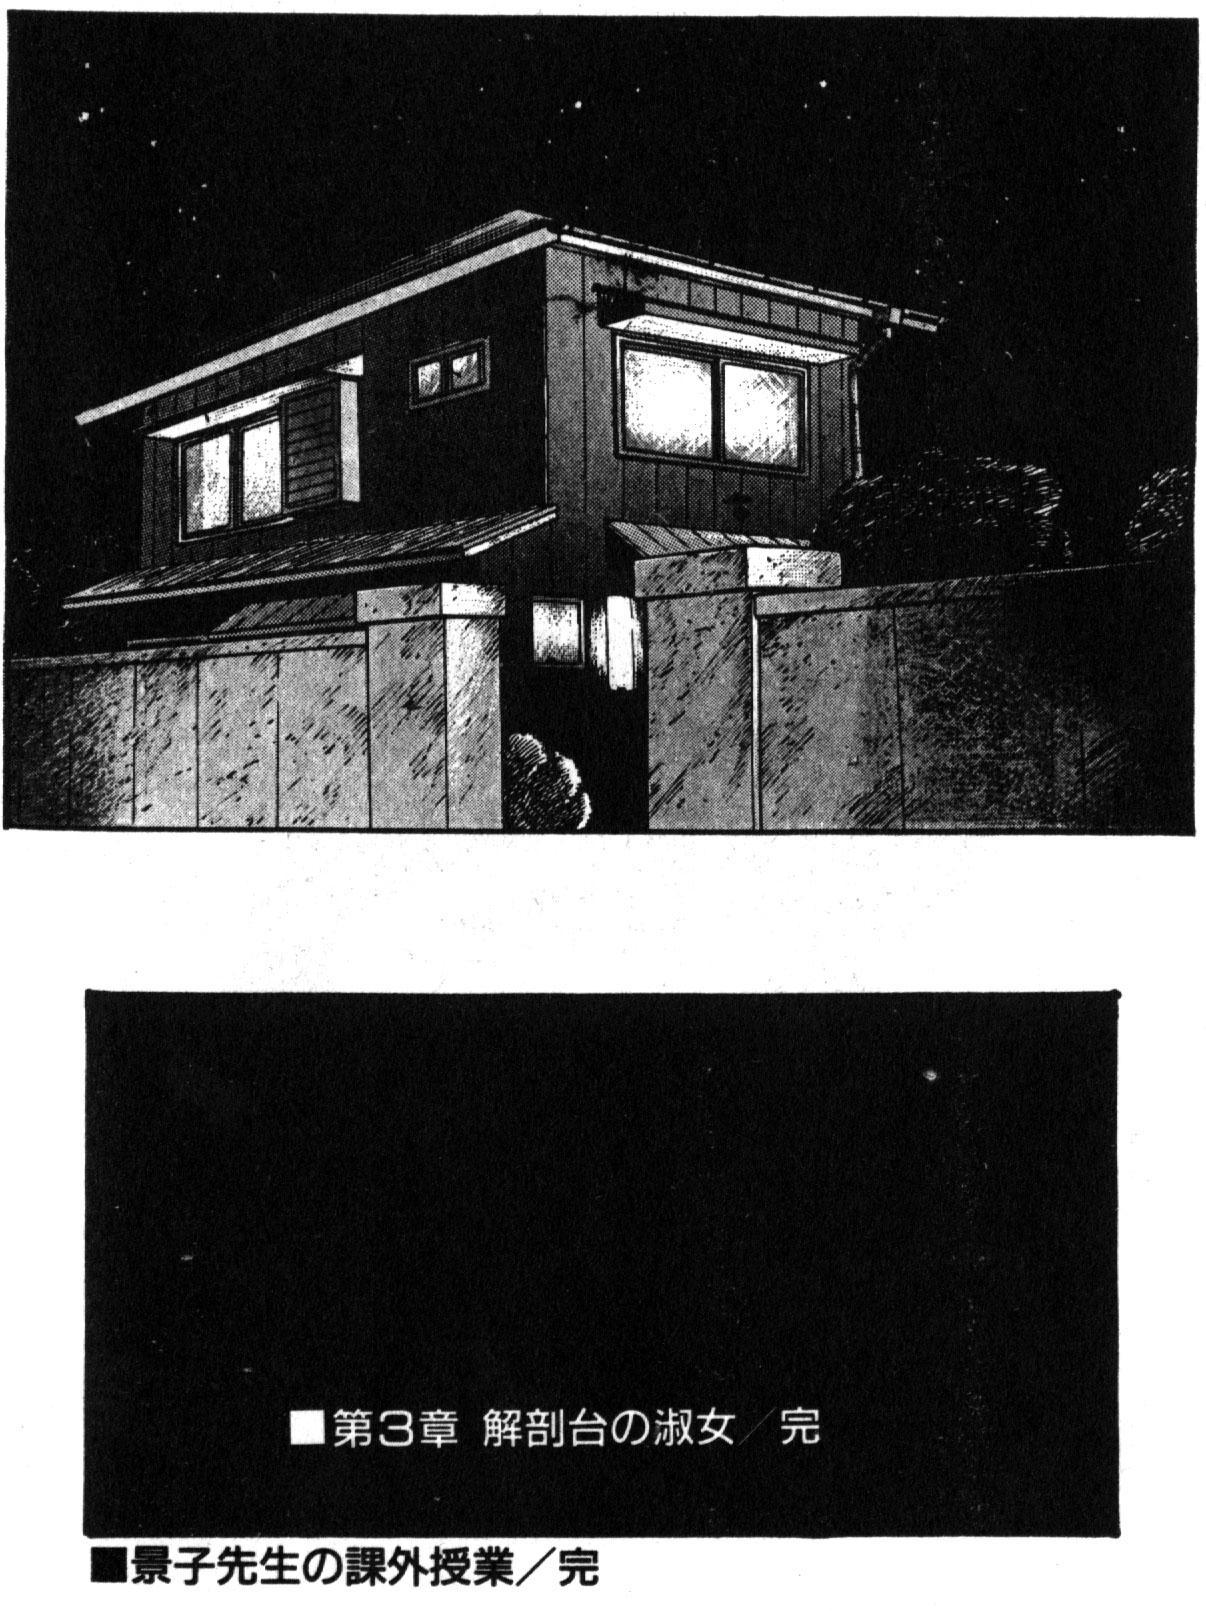 Keiko Sensei no Kagai Jugyou - Keiko Sensei Series 1 246